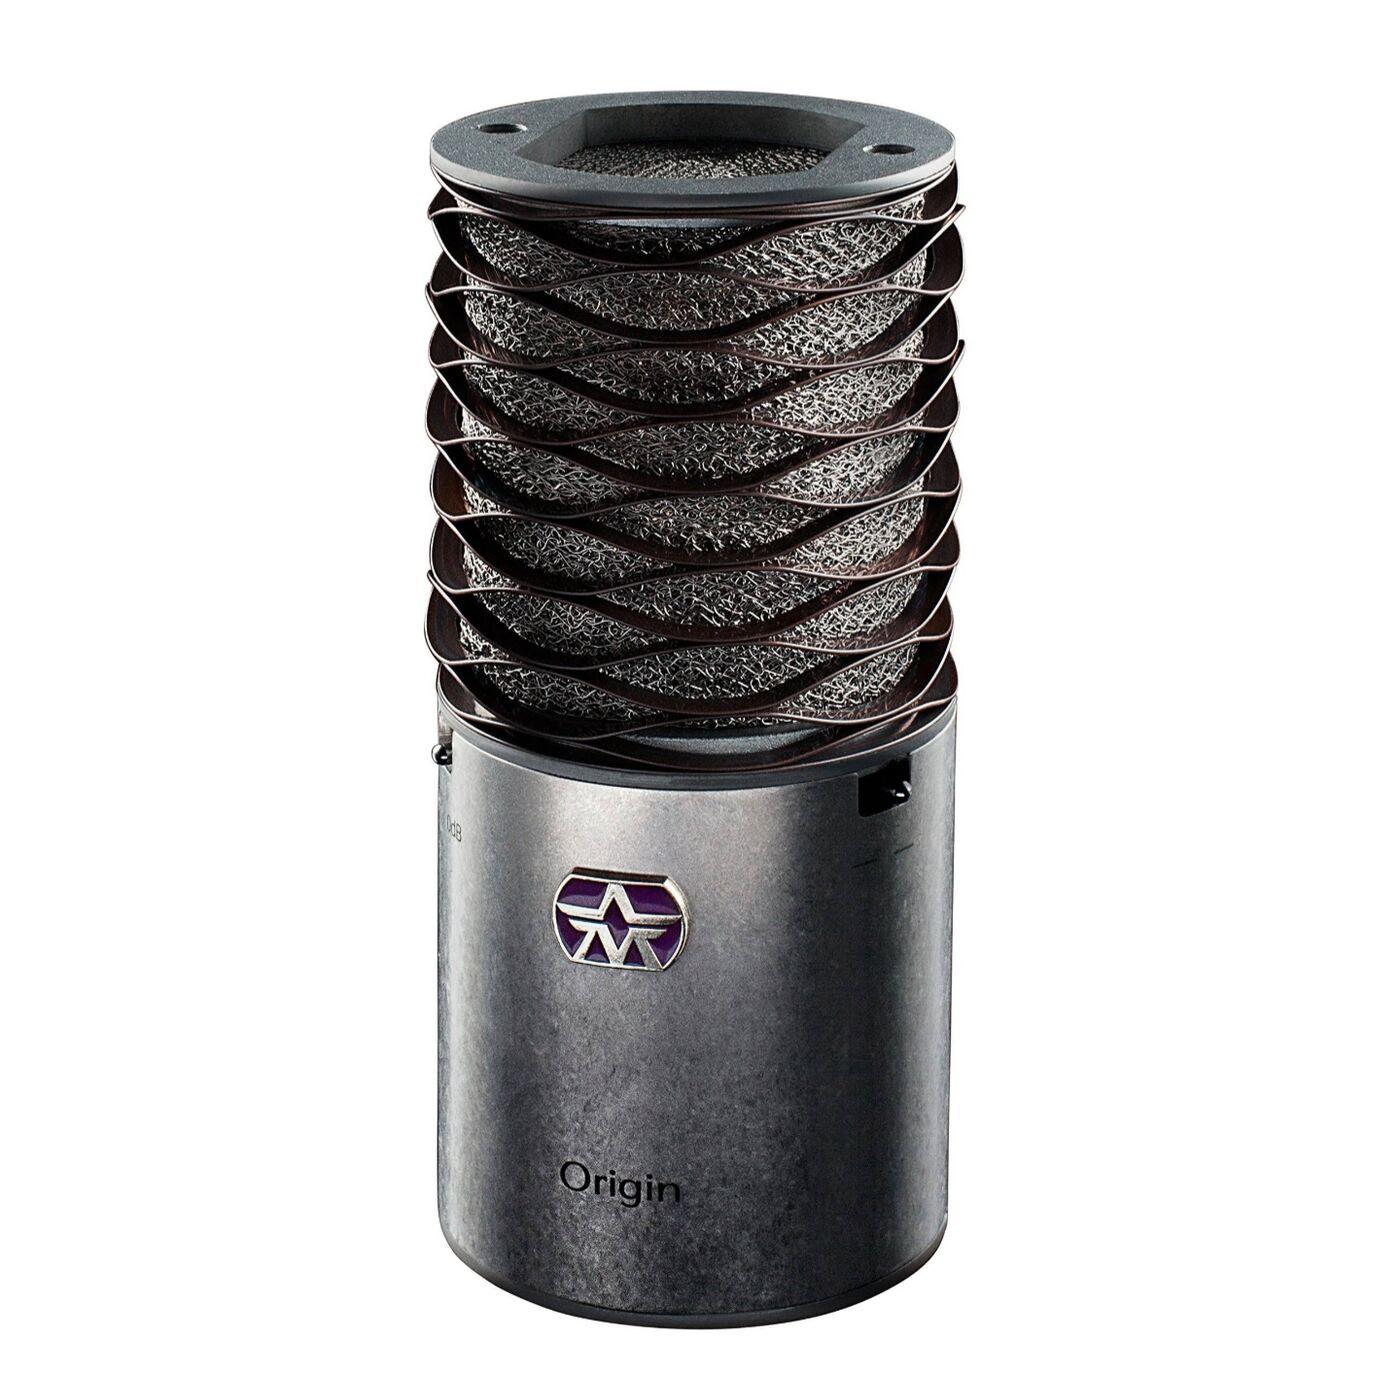 The Aston Origin Microphone